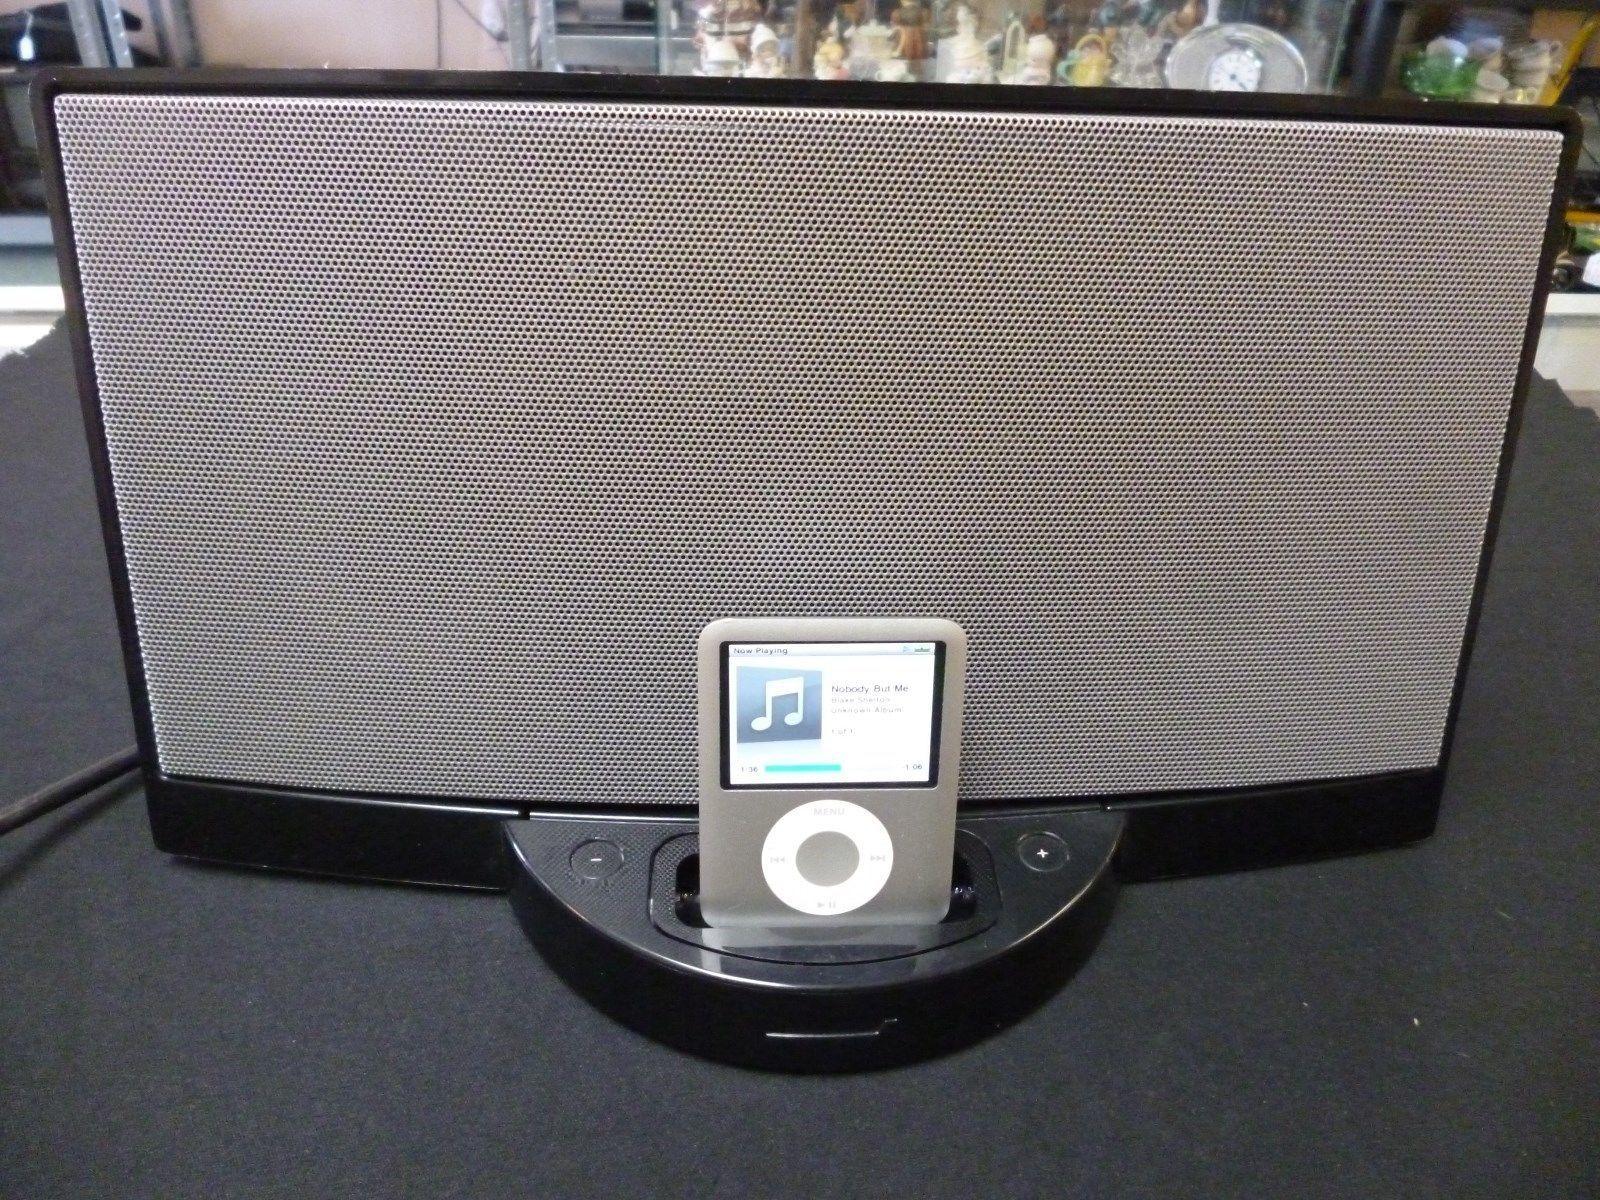 bose sound dock series 1 portable iphone ipod speaker system w 8gb ipod remote audio docks. Black Bedroom Furniture Sets. Home Design Ideas